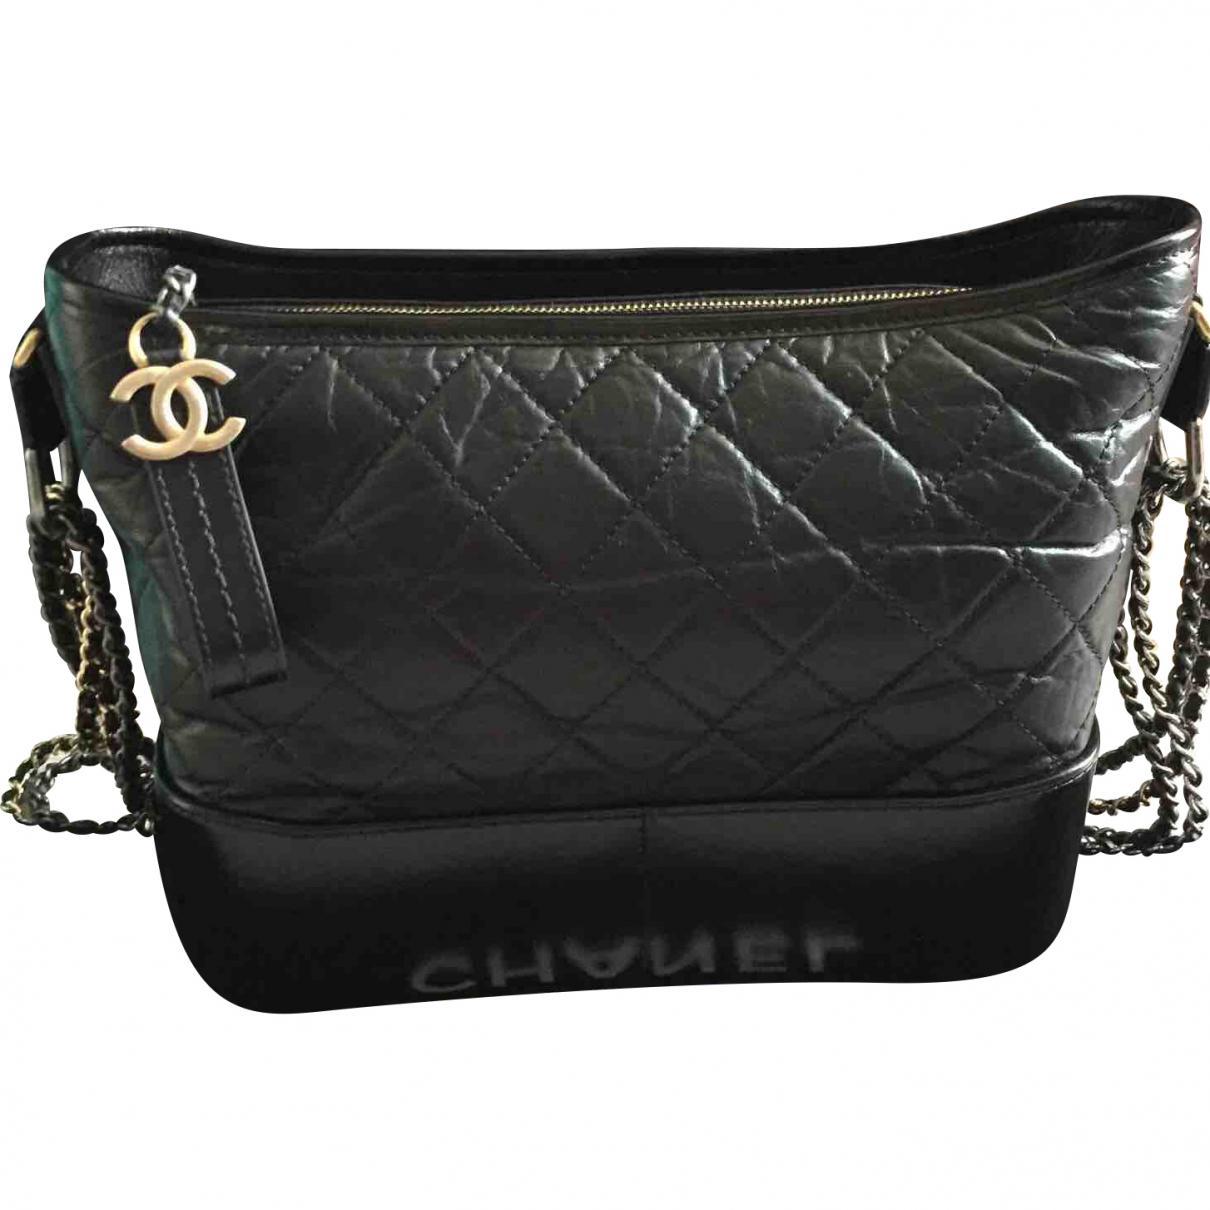 Pre-owned - Crossbody bag Chanel 22FE703fBU